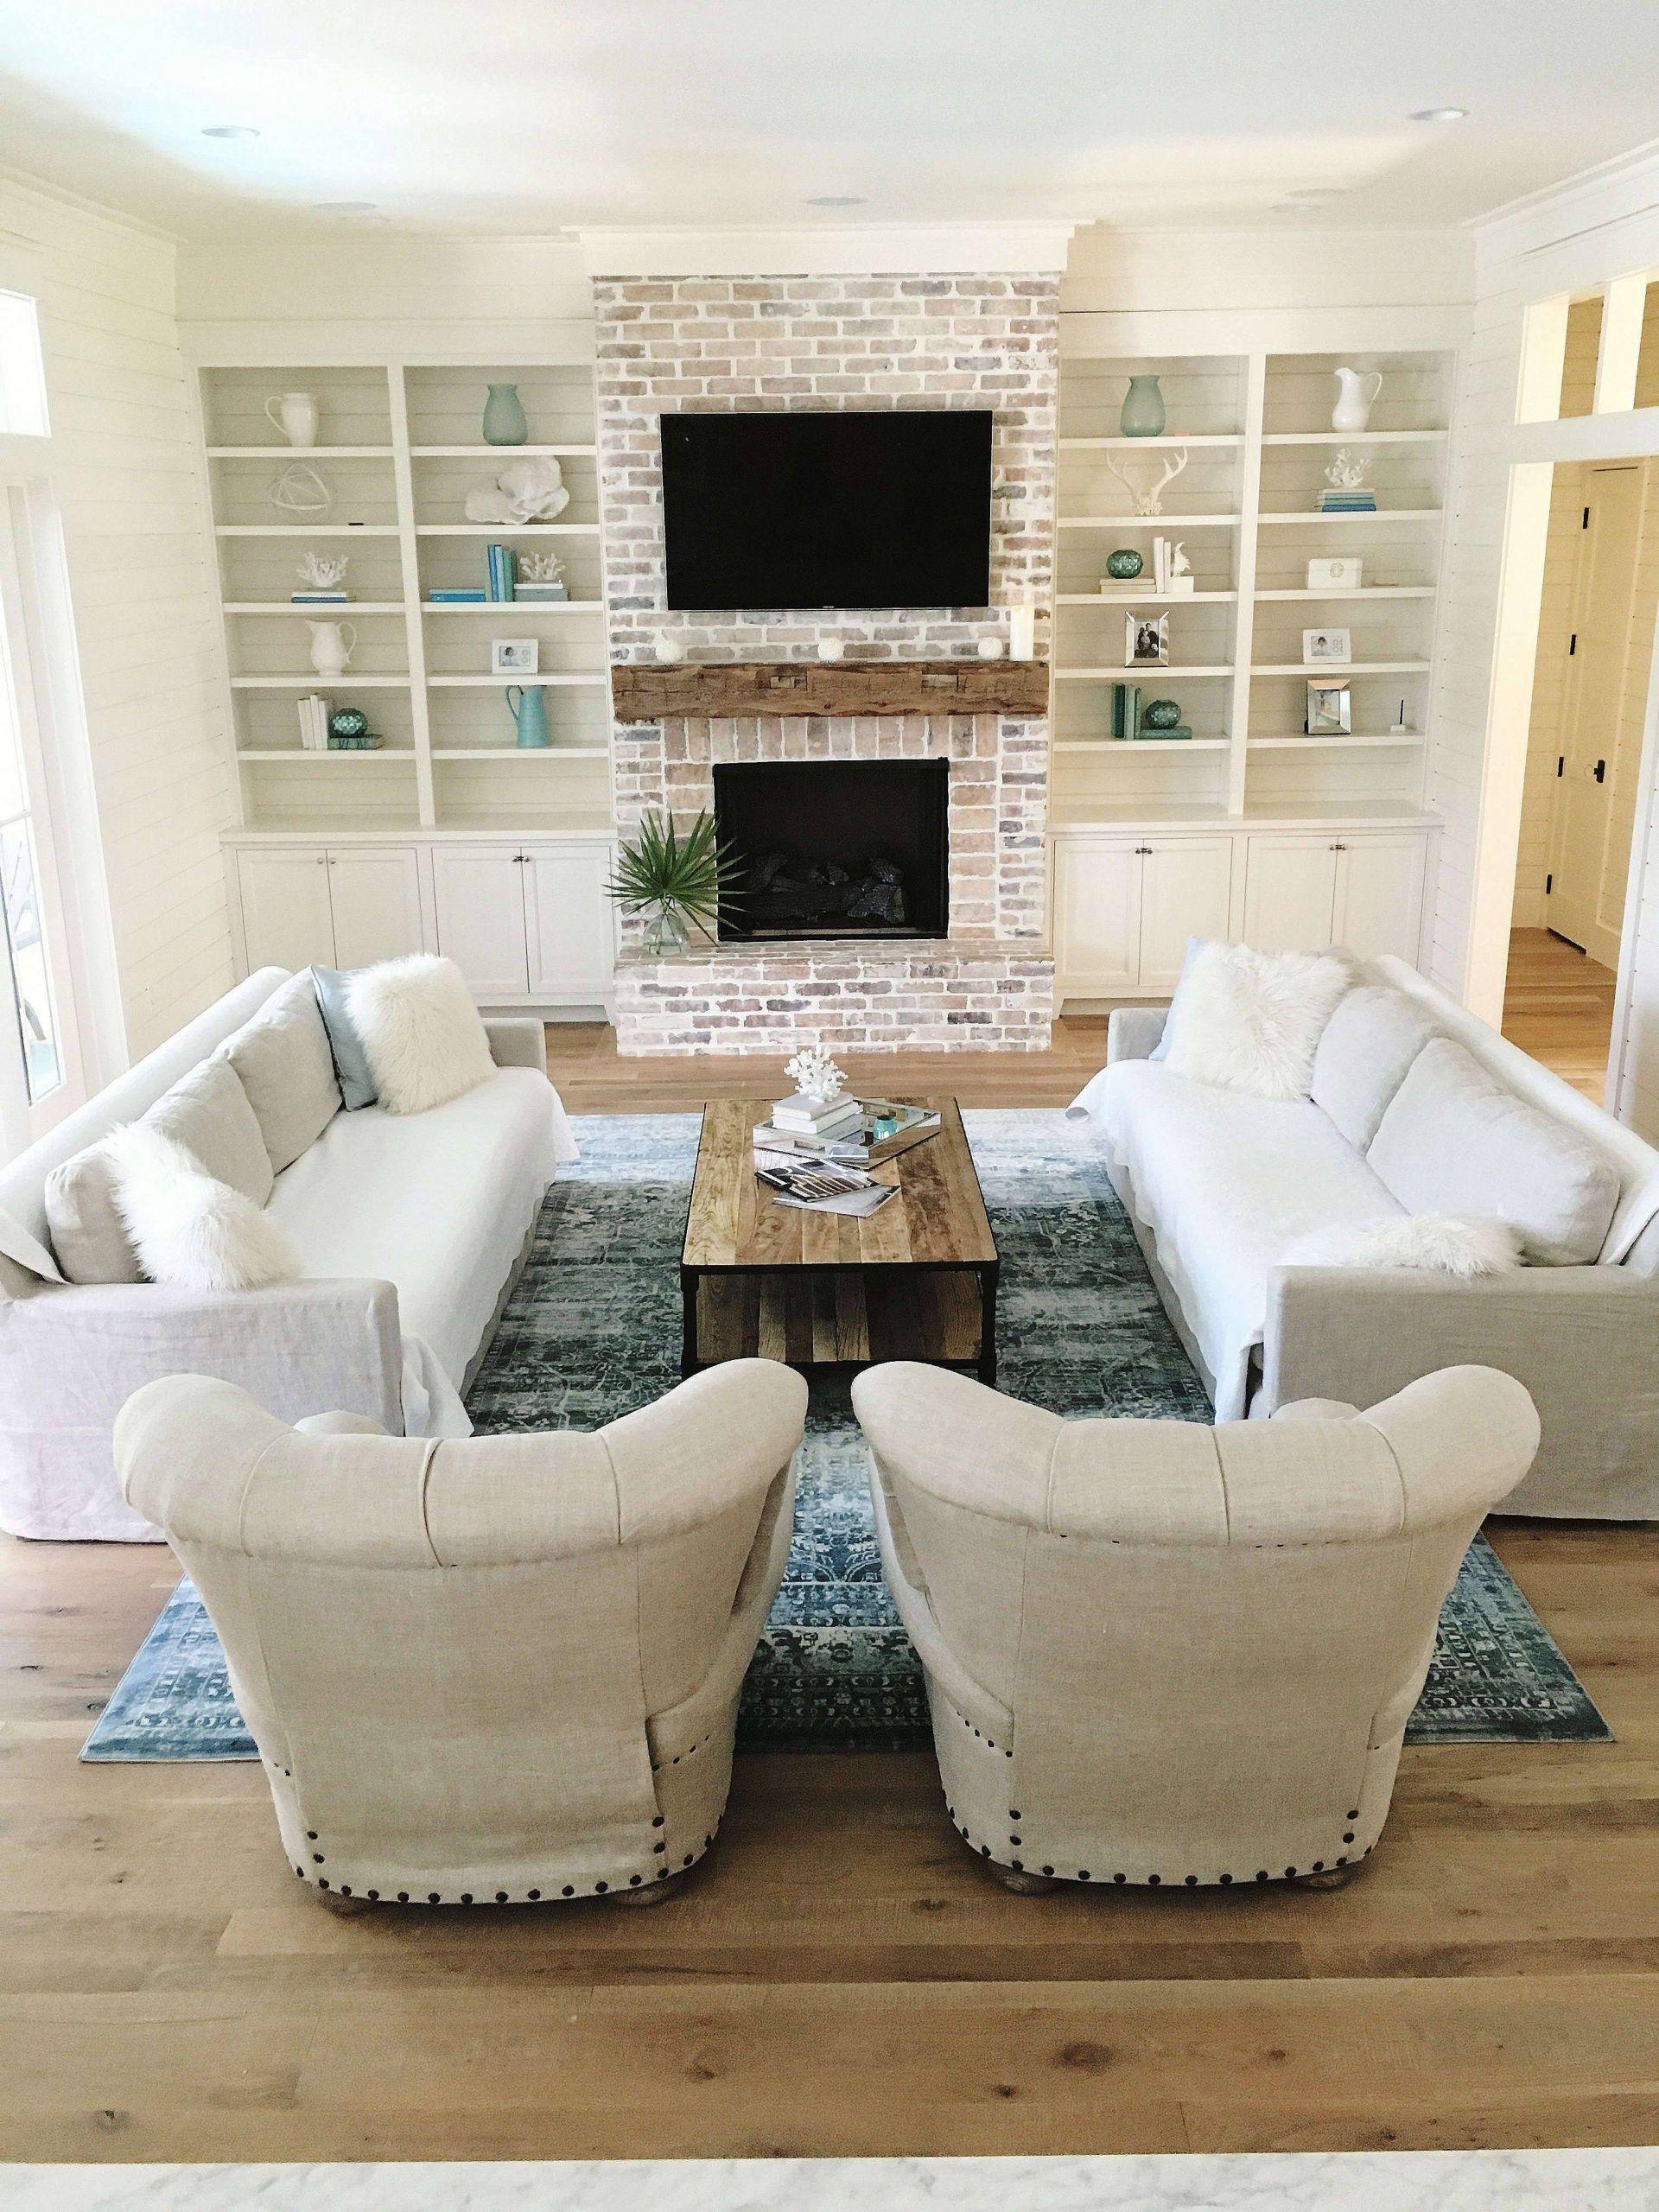 home interior design photos hall modern living room furniture new gunstige sofa macys furniture 0d scheme modern home decorating